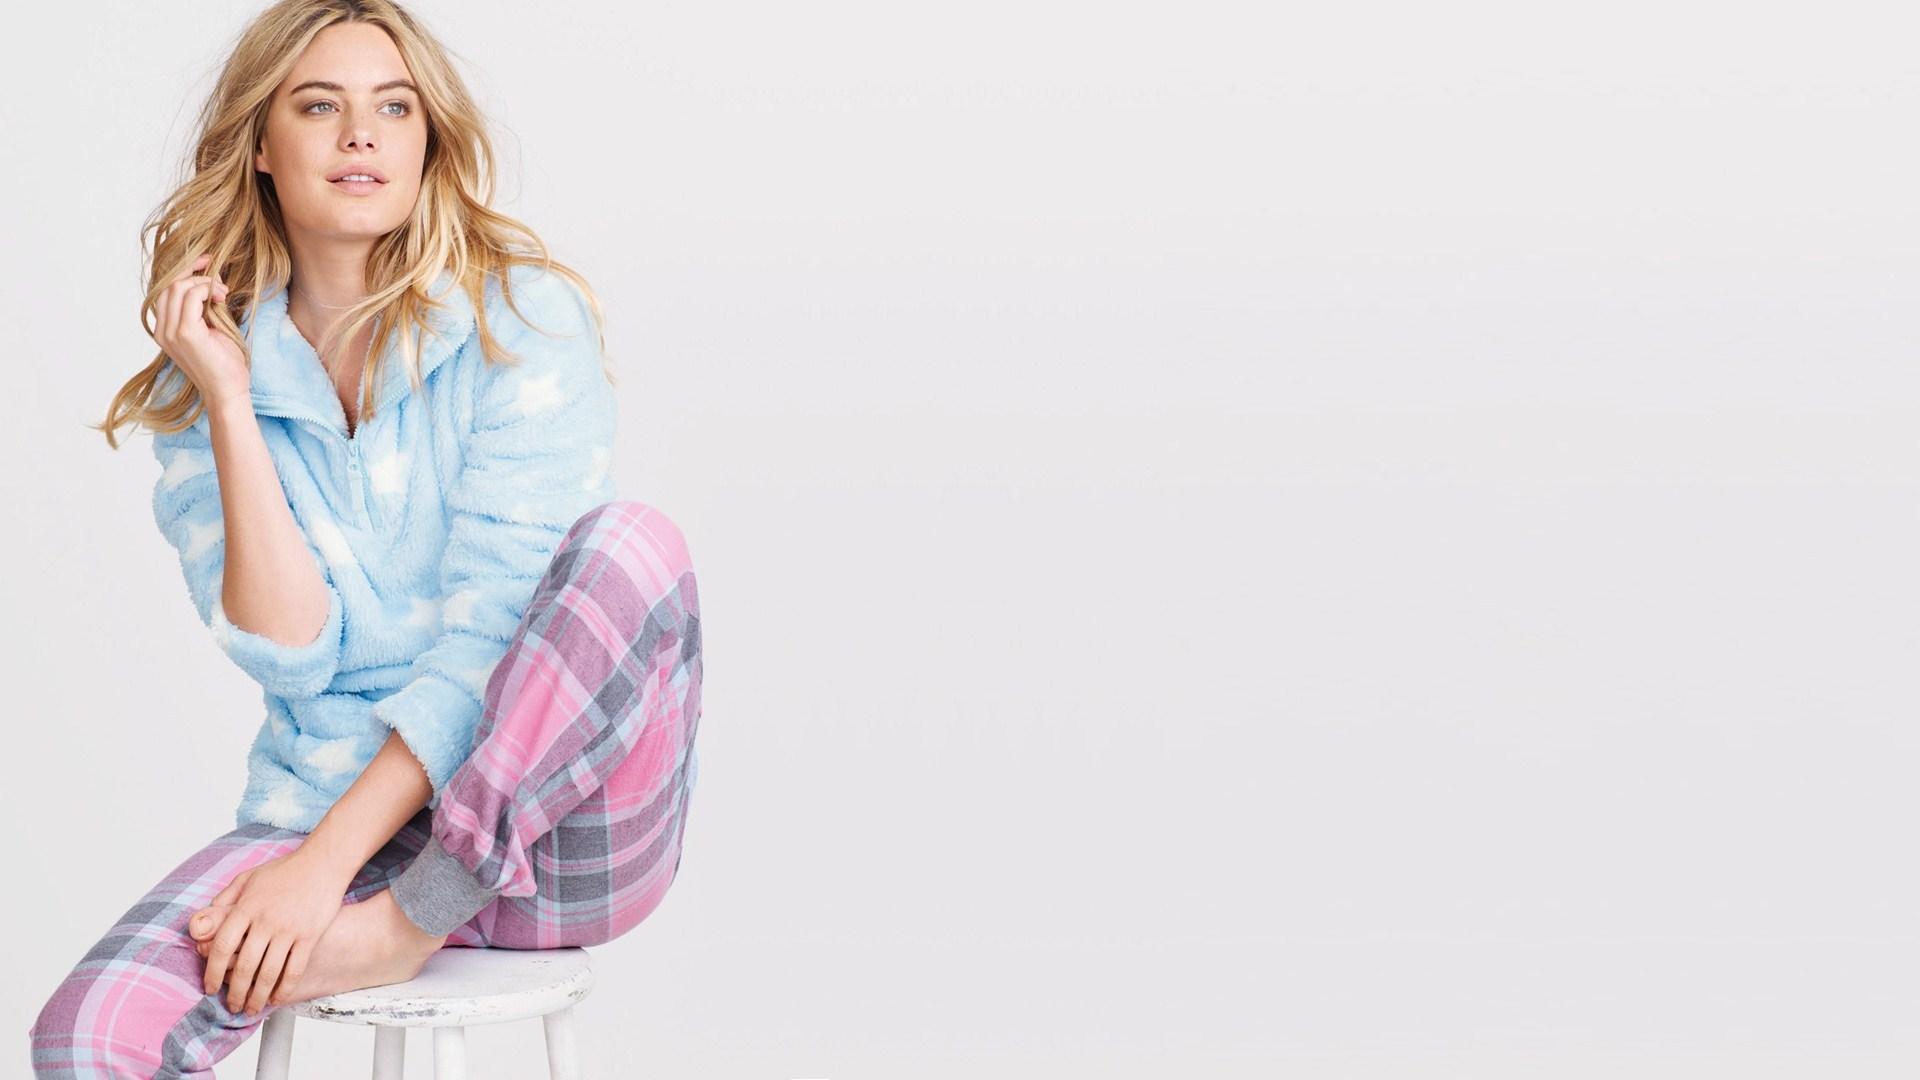 camille rowe pajamas desktop wallpaper 60579